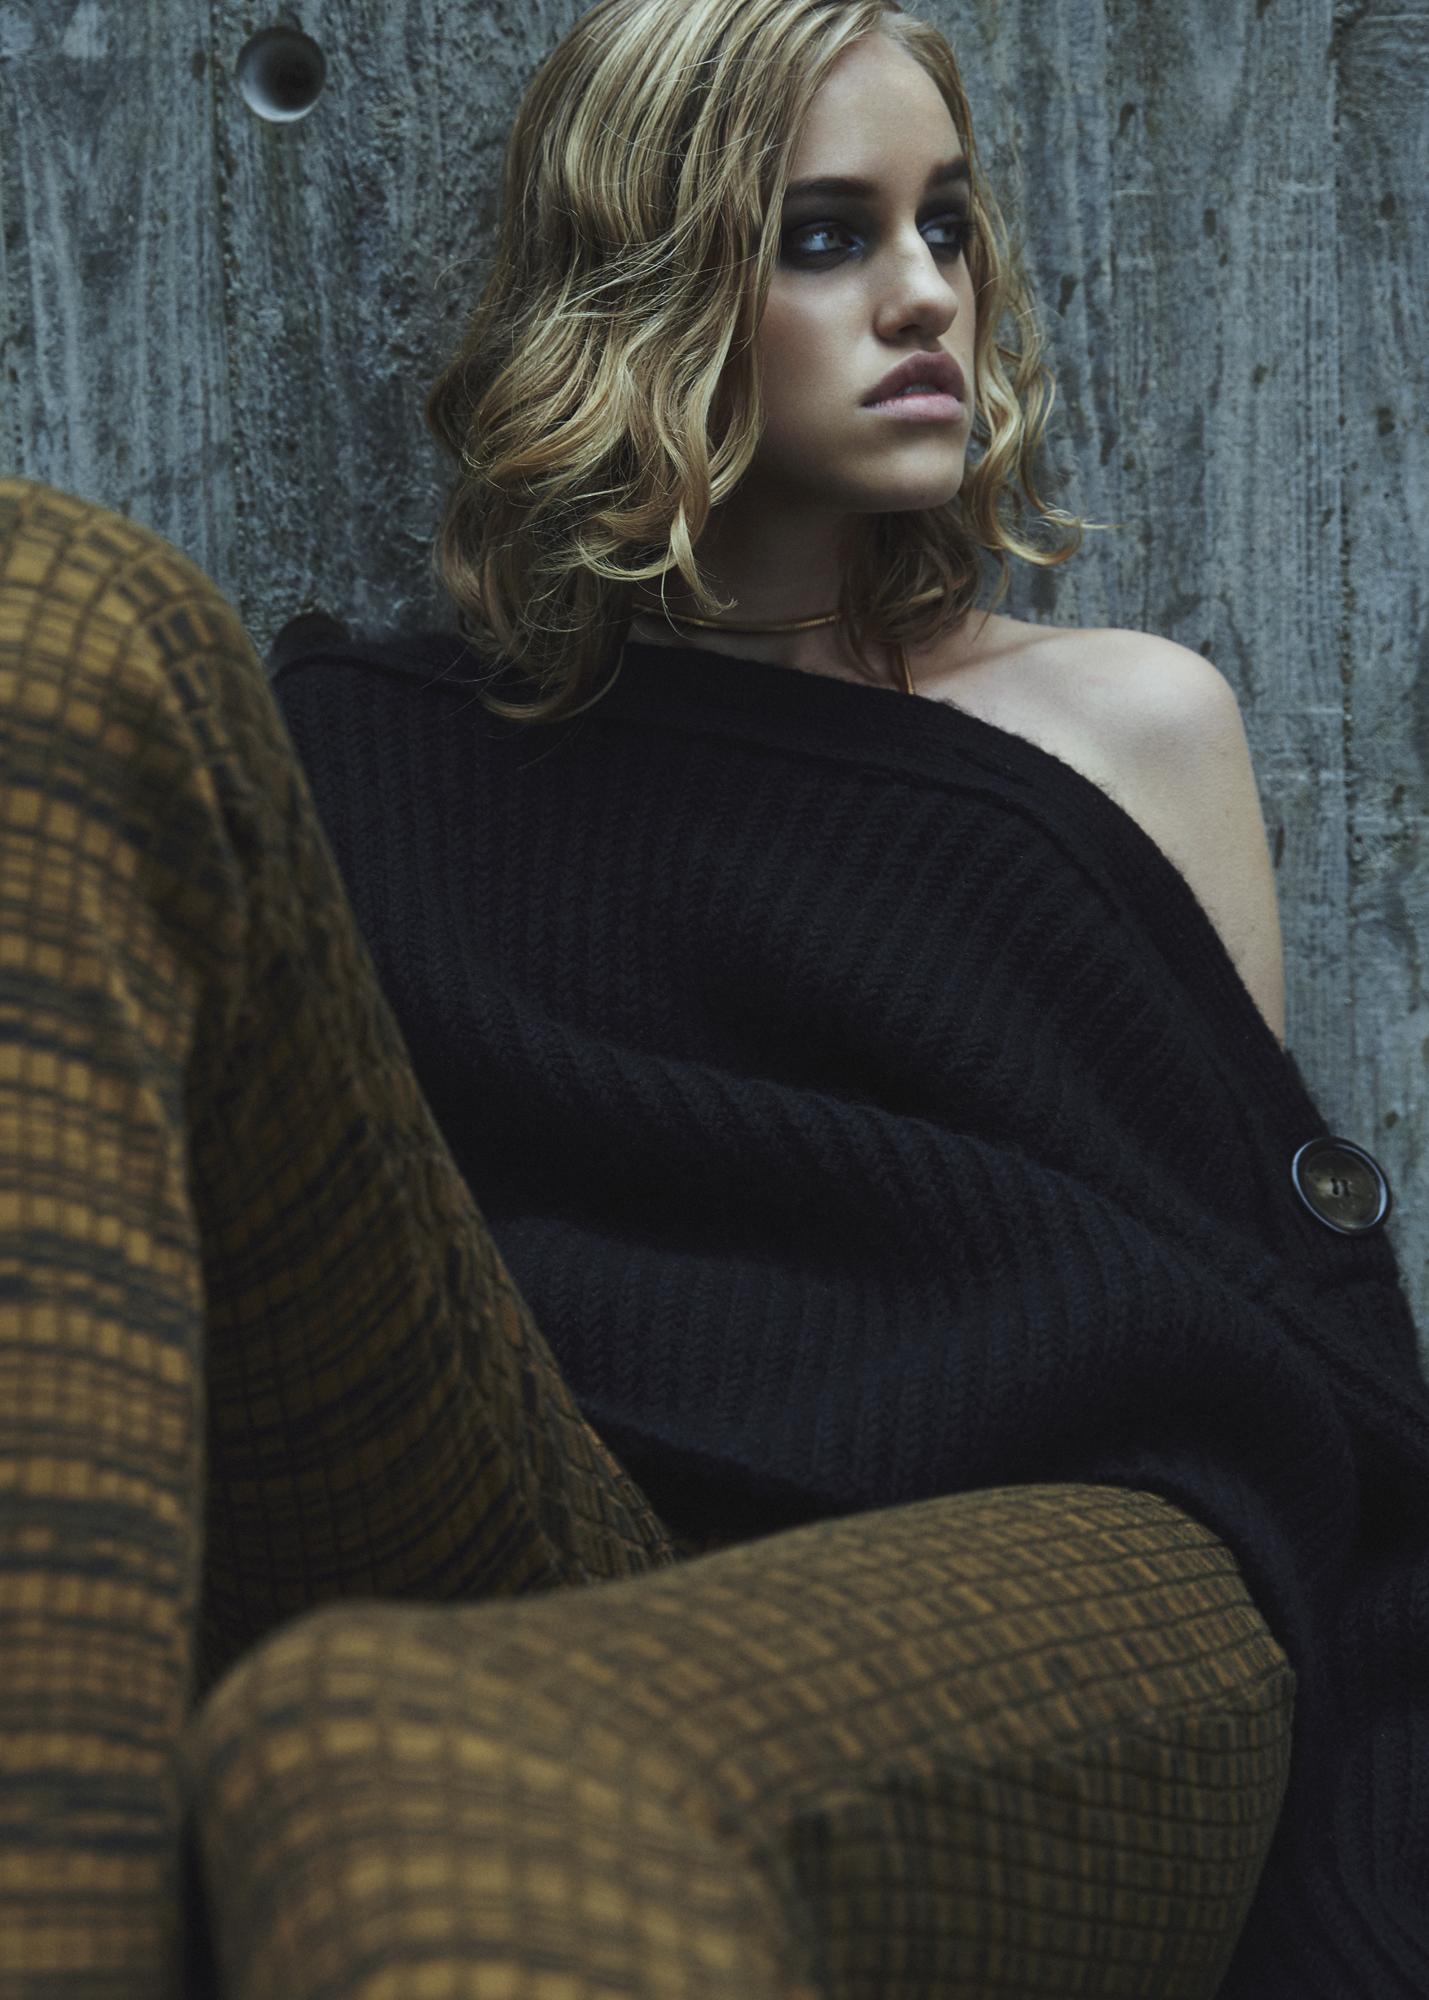 necklaces  LARA BOHINC , knit sweater  ACNE STUDIOS , trousers  BAUM UND PFERDGARTEN